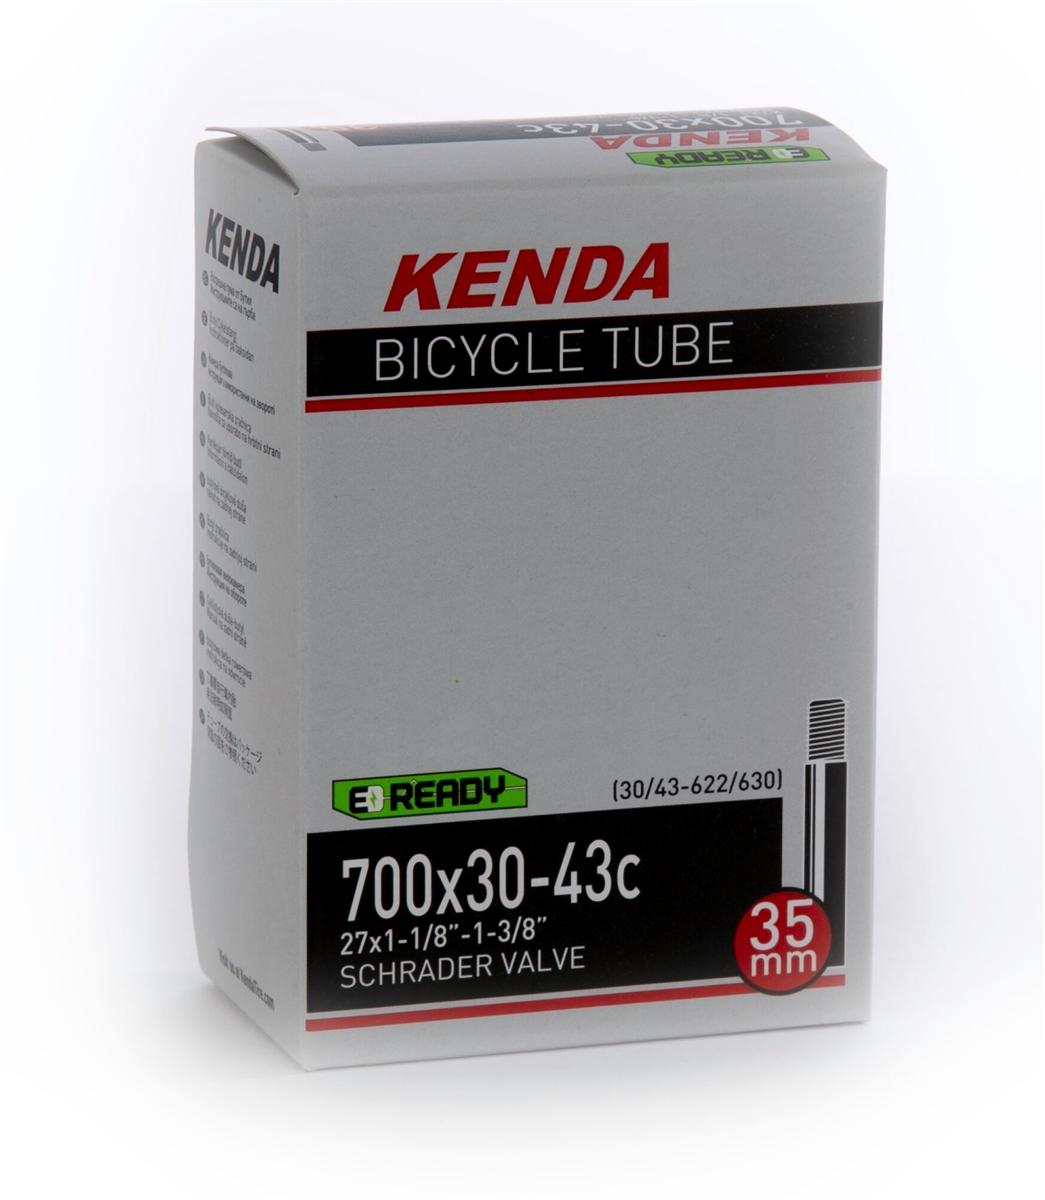 "KENDA 35mm Bicycle Tube 700c x 30-43/"" Schrader valve"